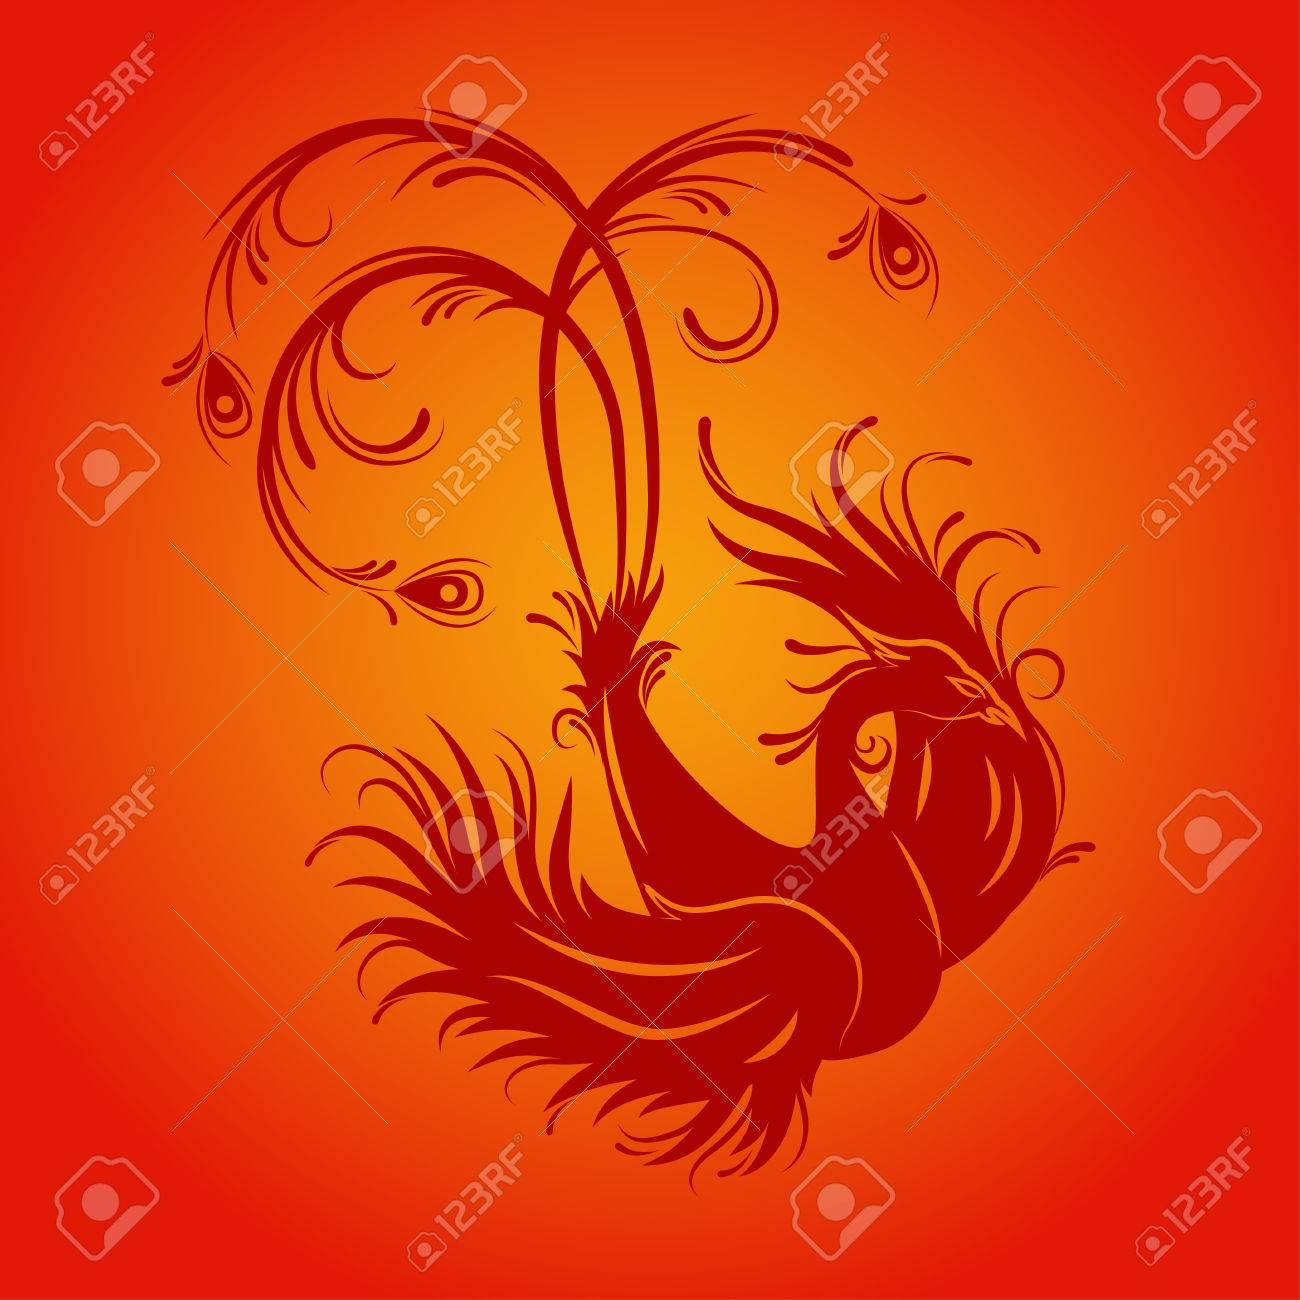 Silhouette of phoenix bird red fenix symbol of immortality silhouette of phoenix bird red fenix symbol of immortality fiery bird stock voltagebd Choice Image